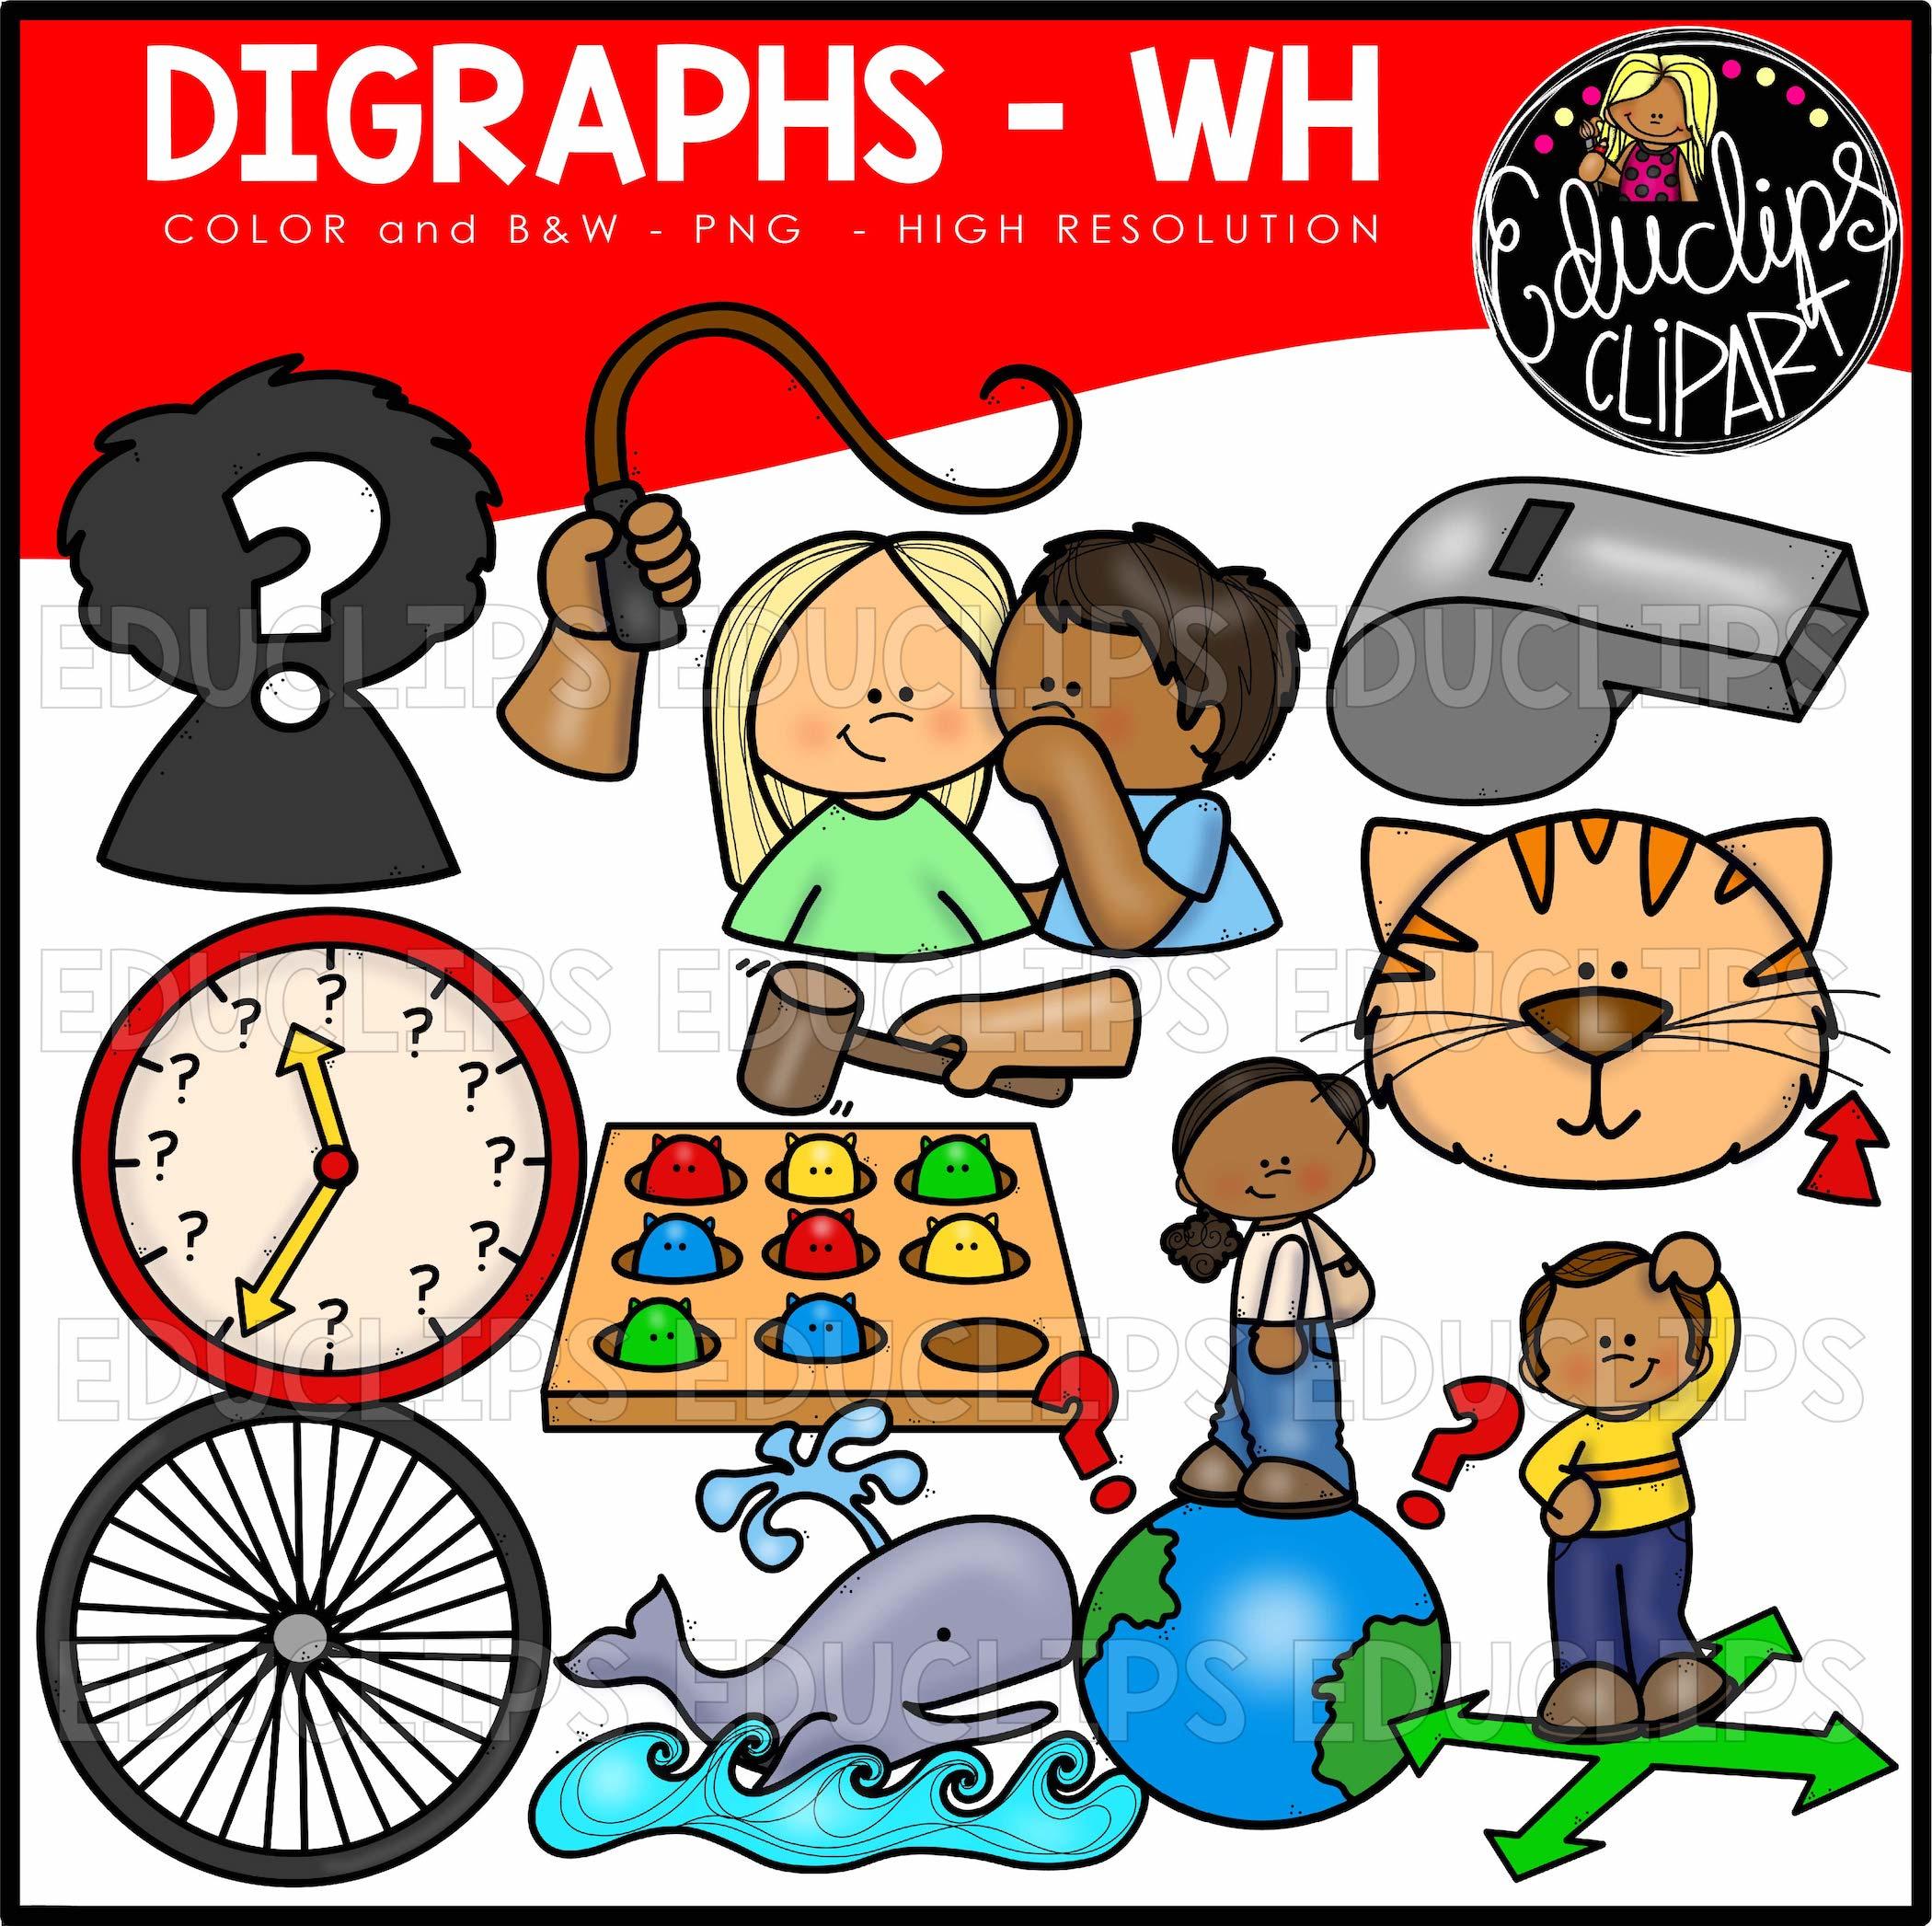 Digraph WH ~ Clip Art Bundle (Color and B&W).